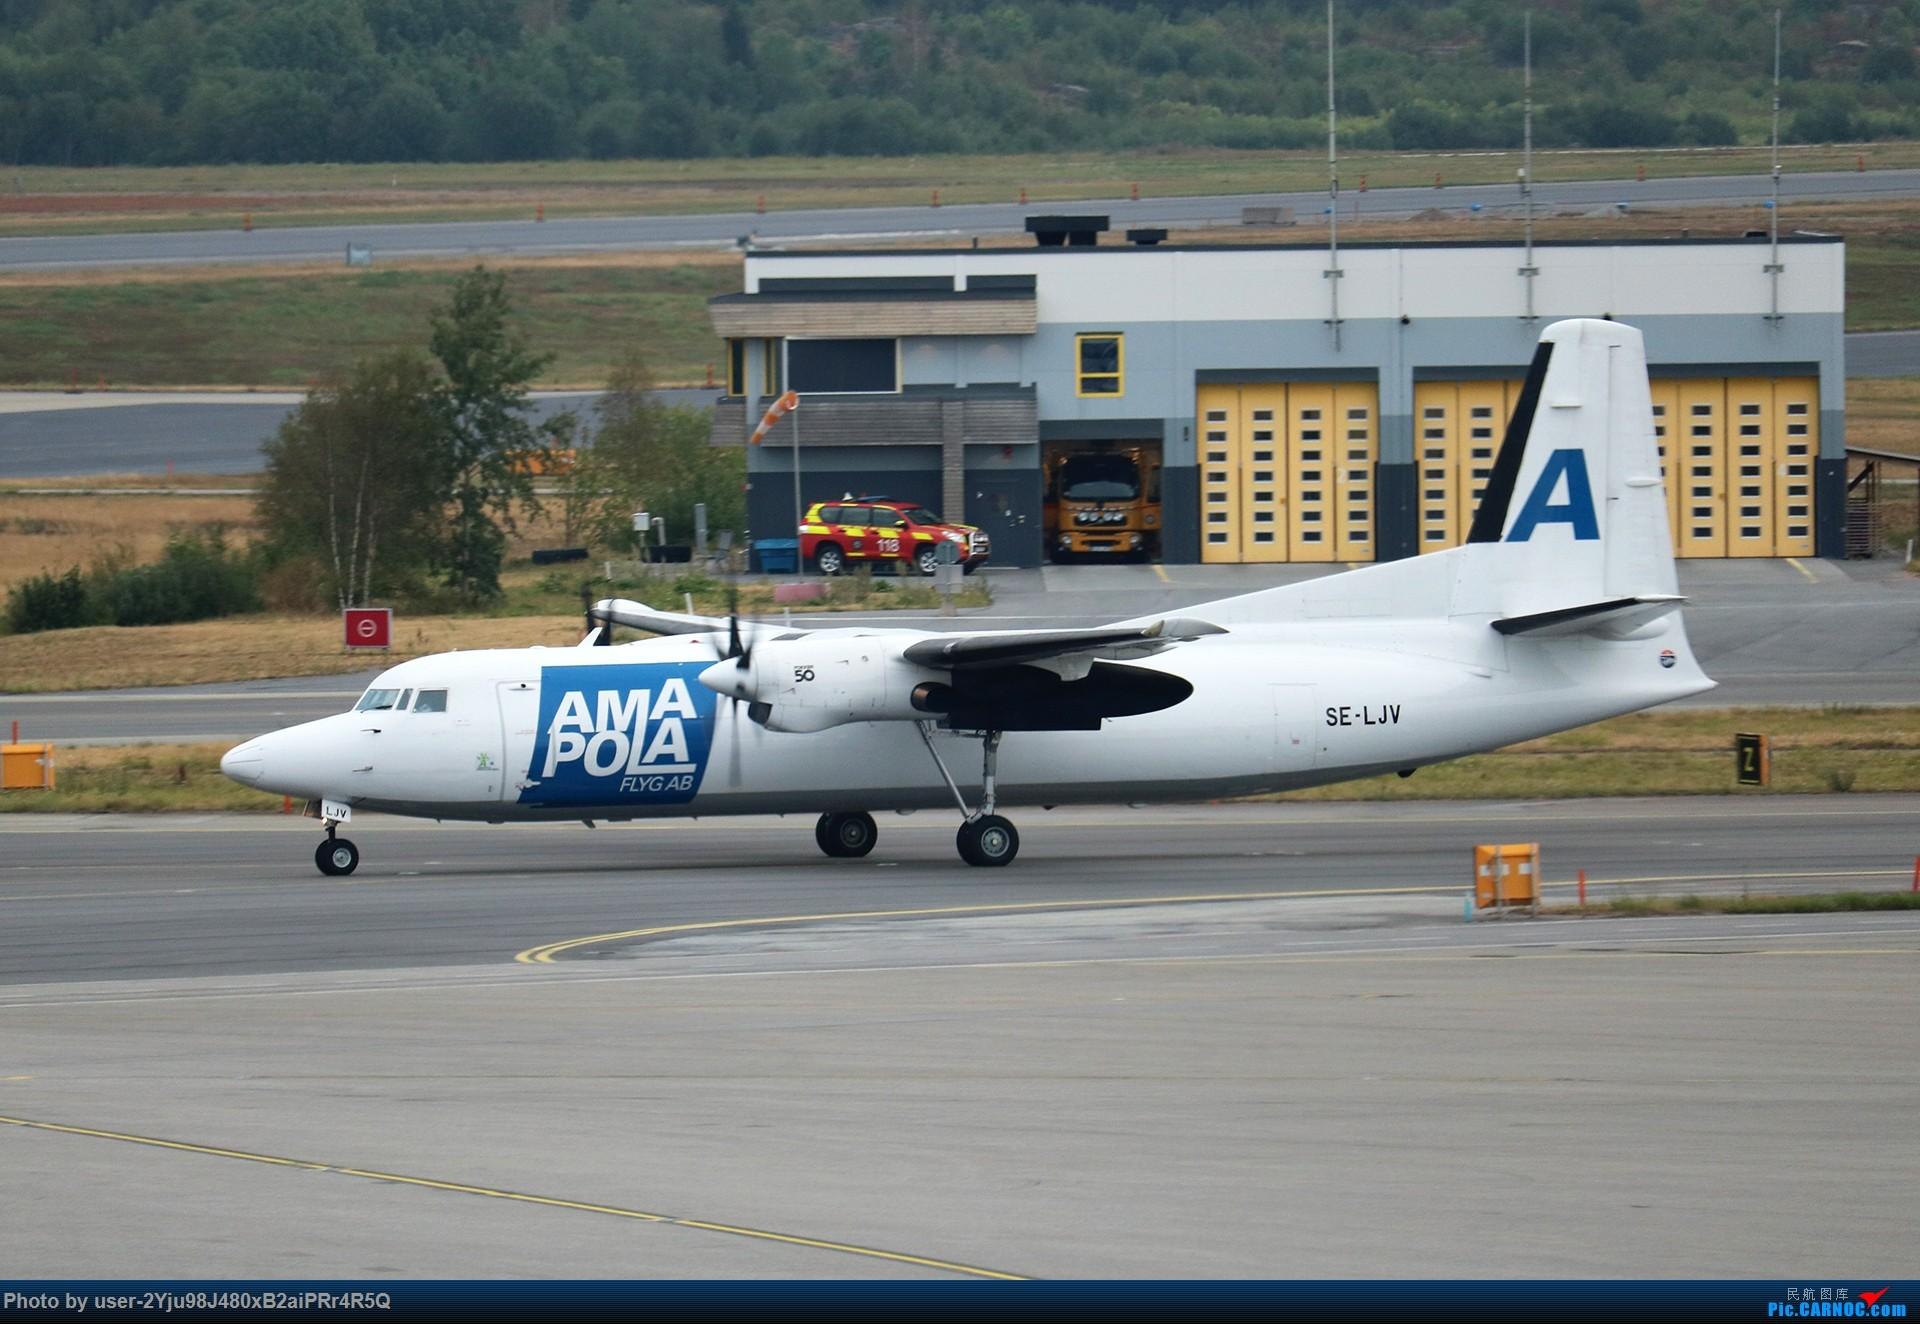 Re:LIULIU|303km航線體驗邊角邊航空ATR-72|SAS機隊概覽